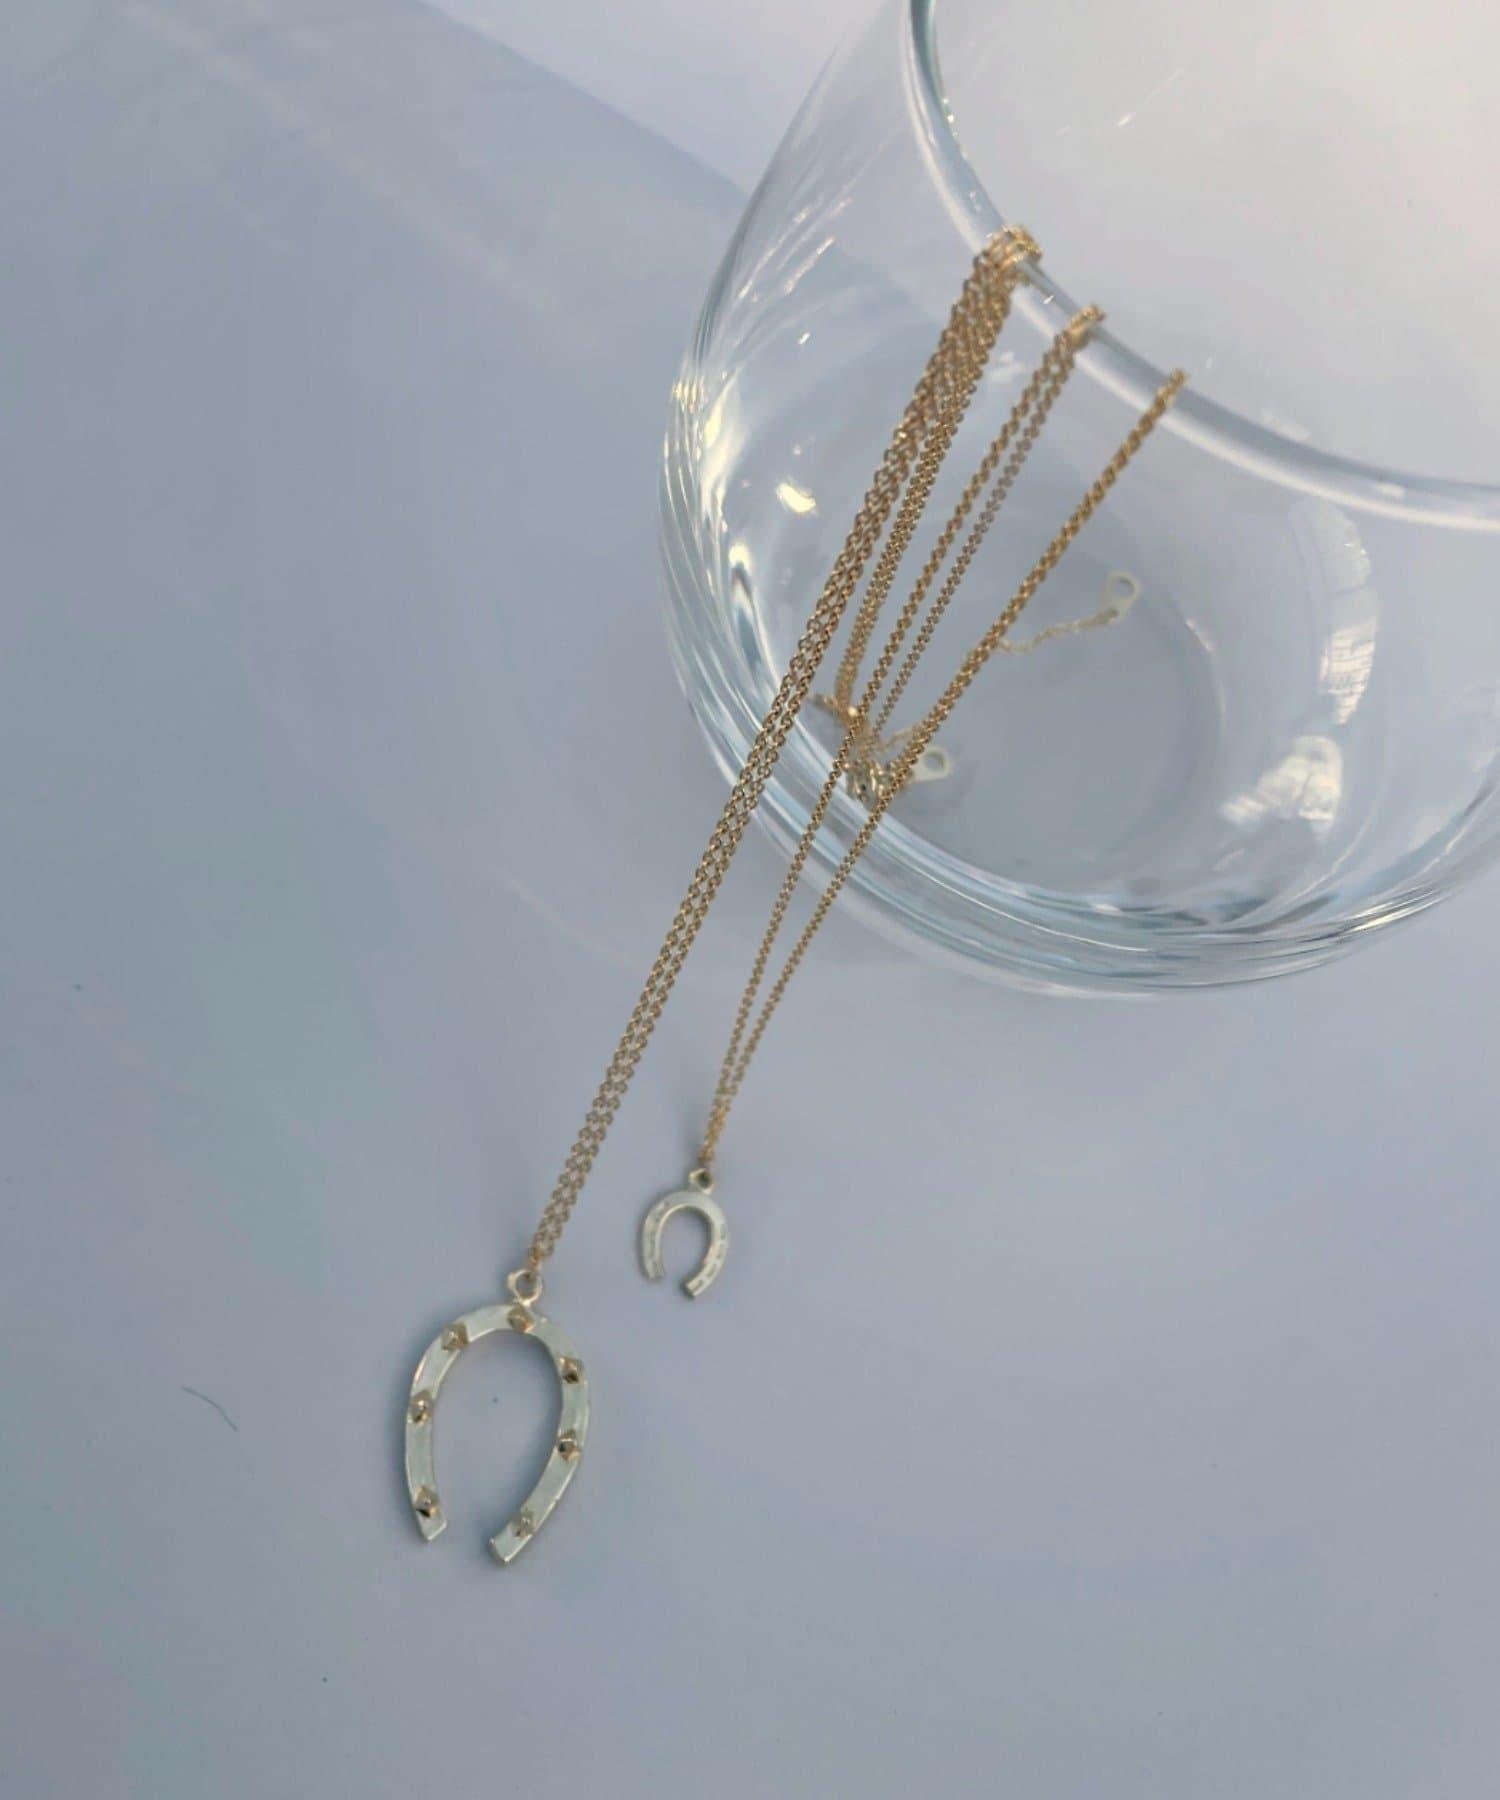 mystic(ミスティック) [eau un bijou] s.hoof(necklace)